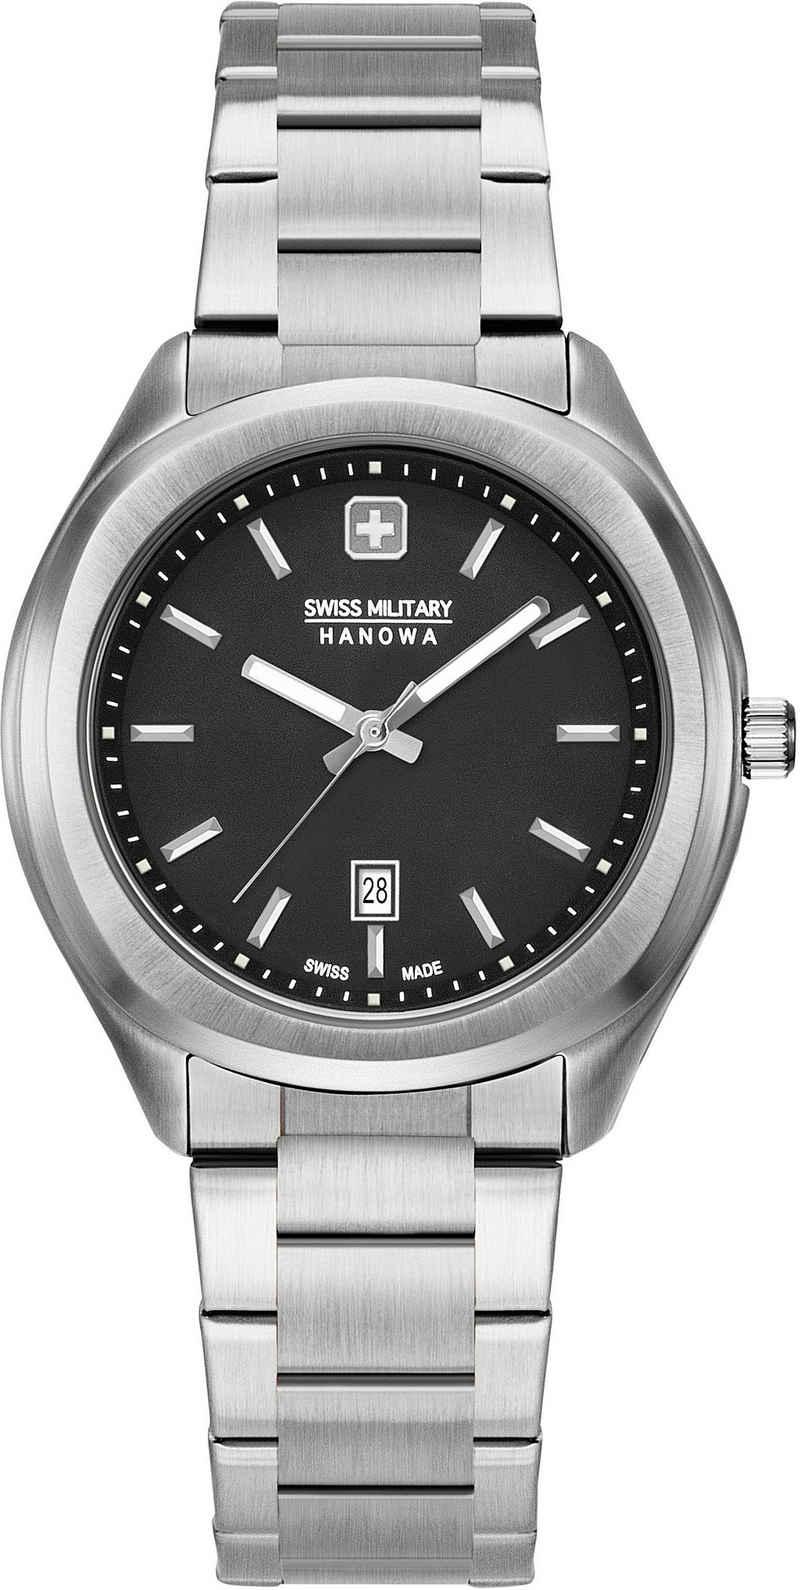 Swiss Military Hanowa Schweizer Uhr »ALPINA, 06-7339.04.007«